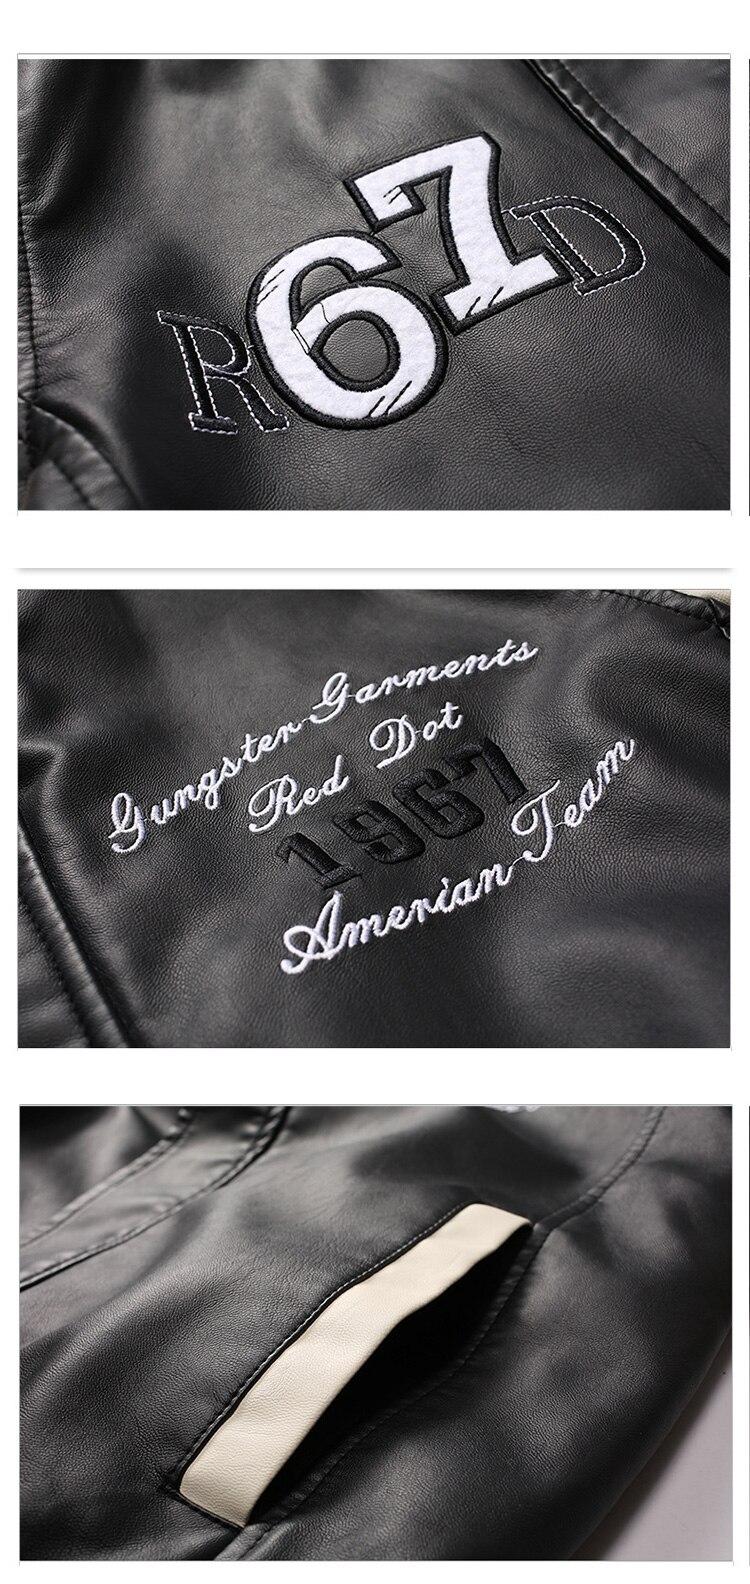 HTB1frnEbRCw3KVjSZR0q6zcUpXaQ New Men Pu Faux Leather Jacket 2019 Brand Embroidery Baseball Jackets Male Casual Luxury Winter Warm Fleece Pilot Bomber Coat